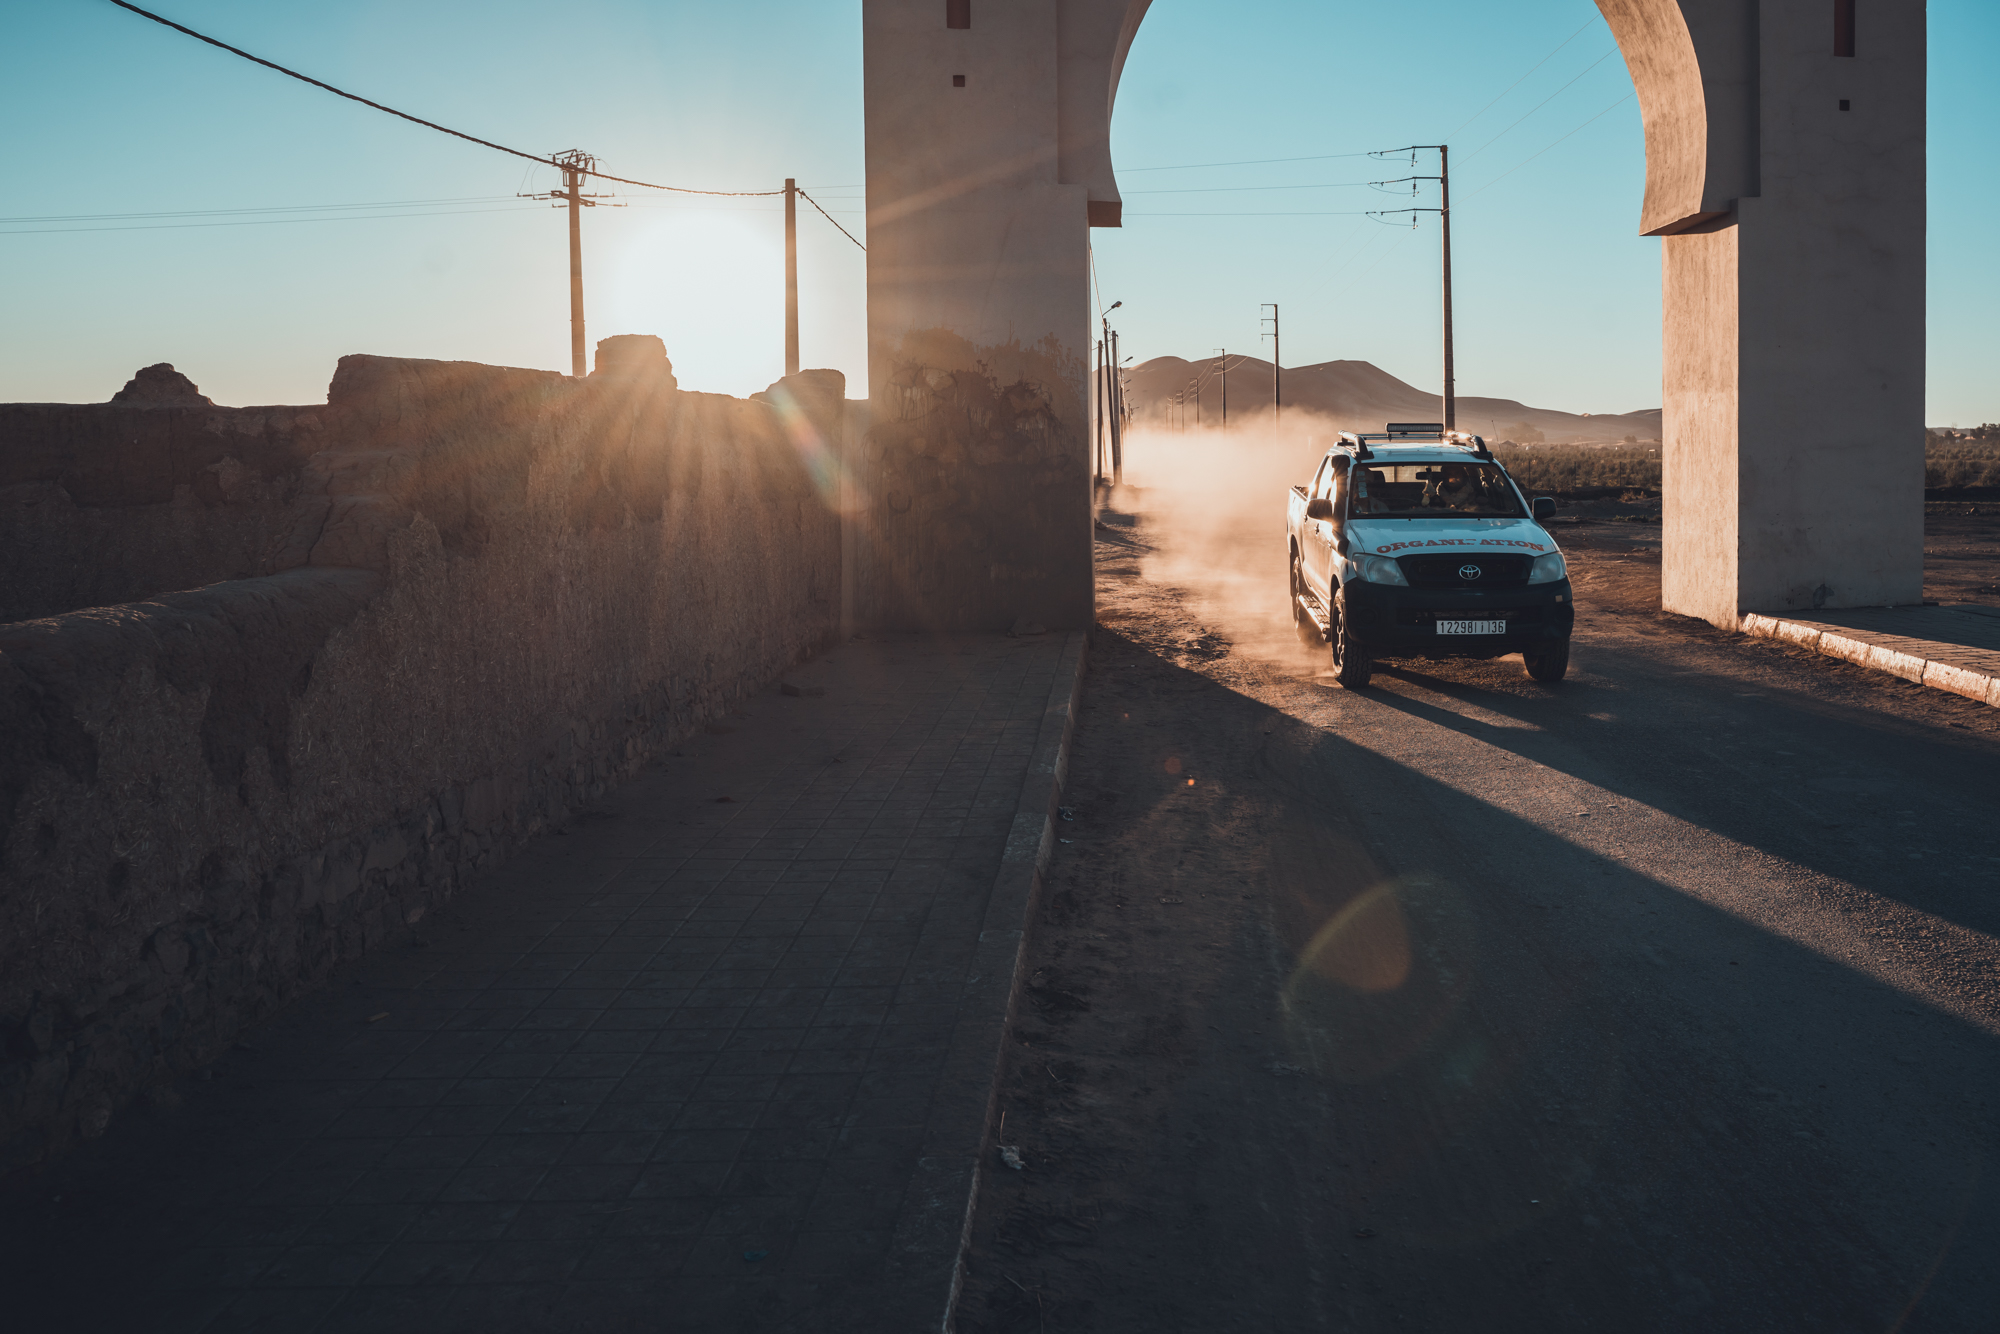 StijnHoekstra_Marocco-7.jpg